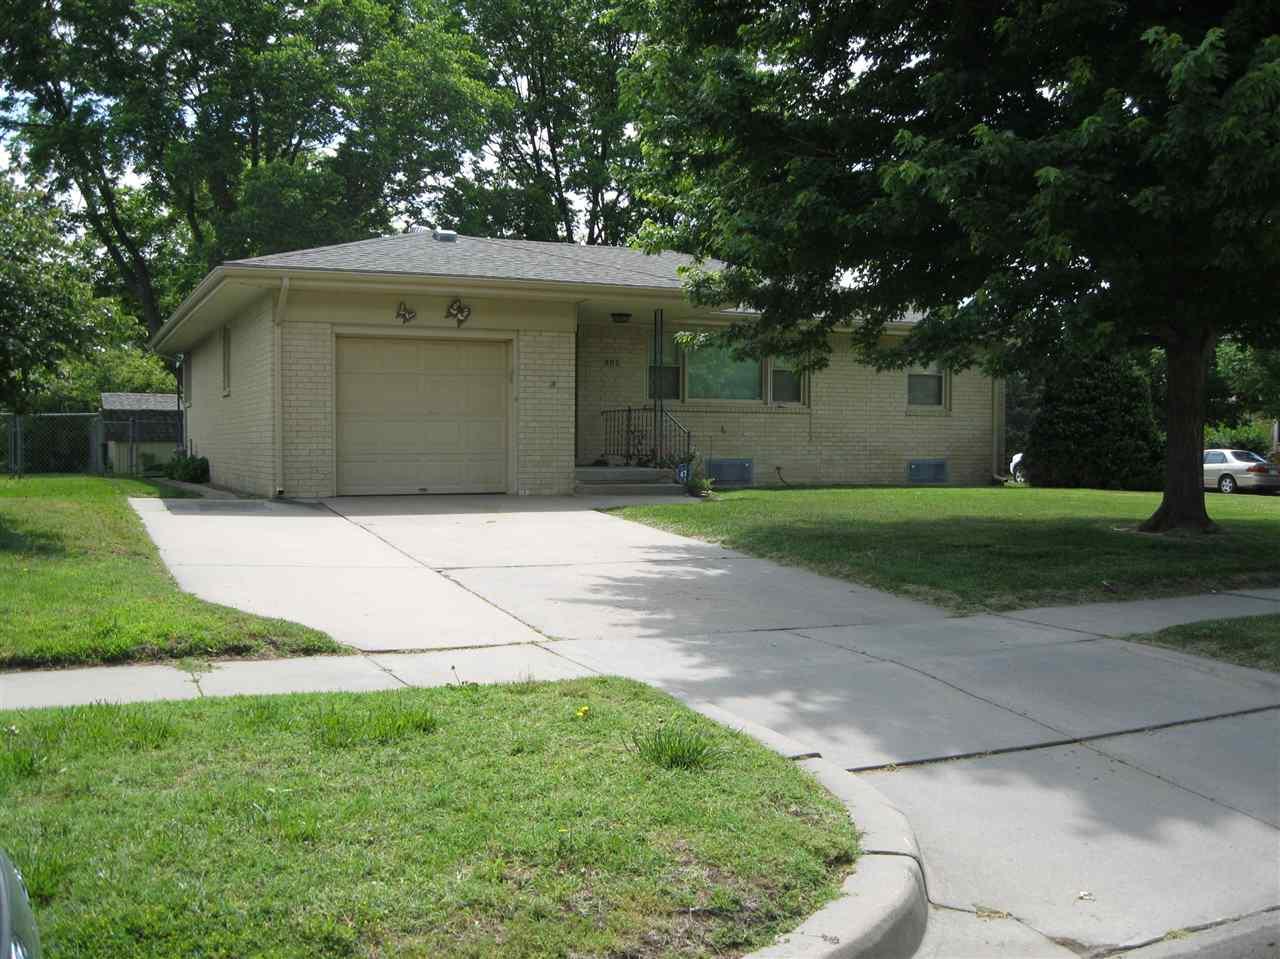 802 N FLORENCE ST, Wichita, KS 67212